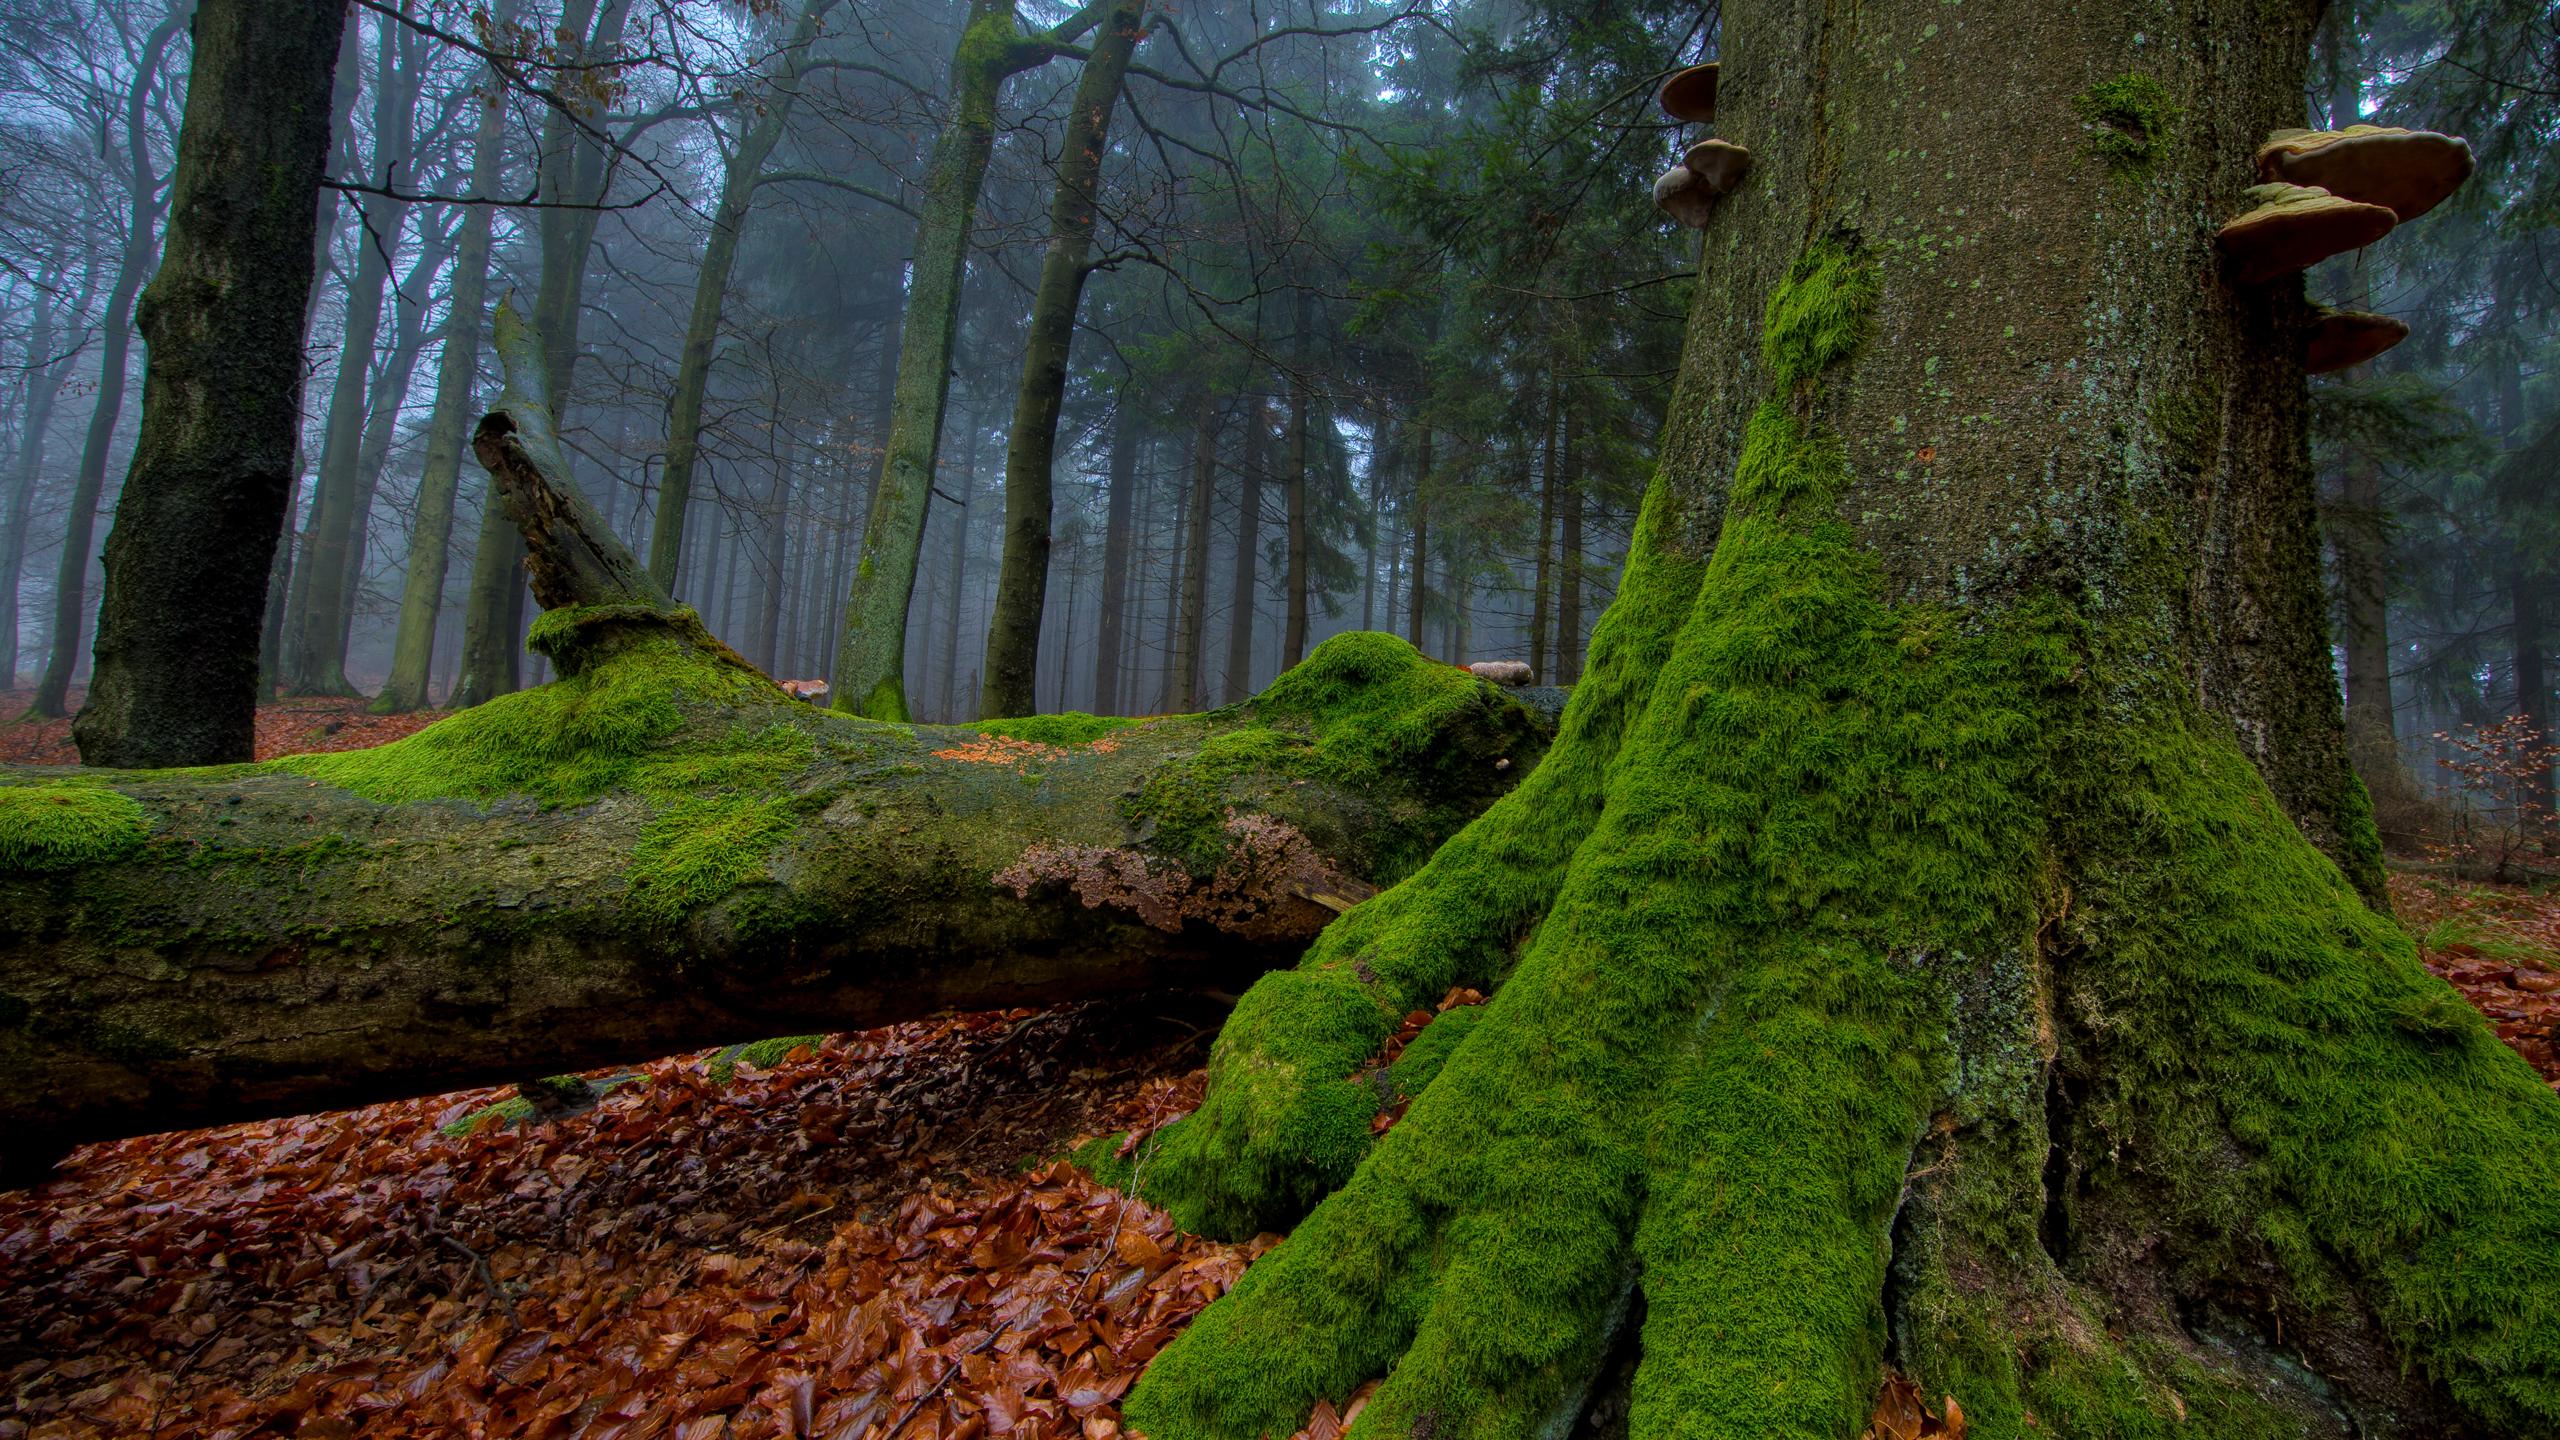 mysterious forest wallpaper hd - HD Desktop Wallpapers | 4k HD